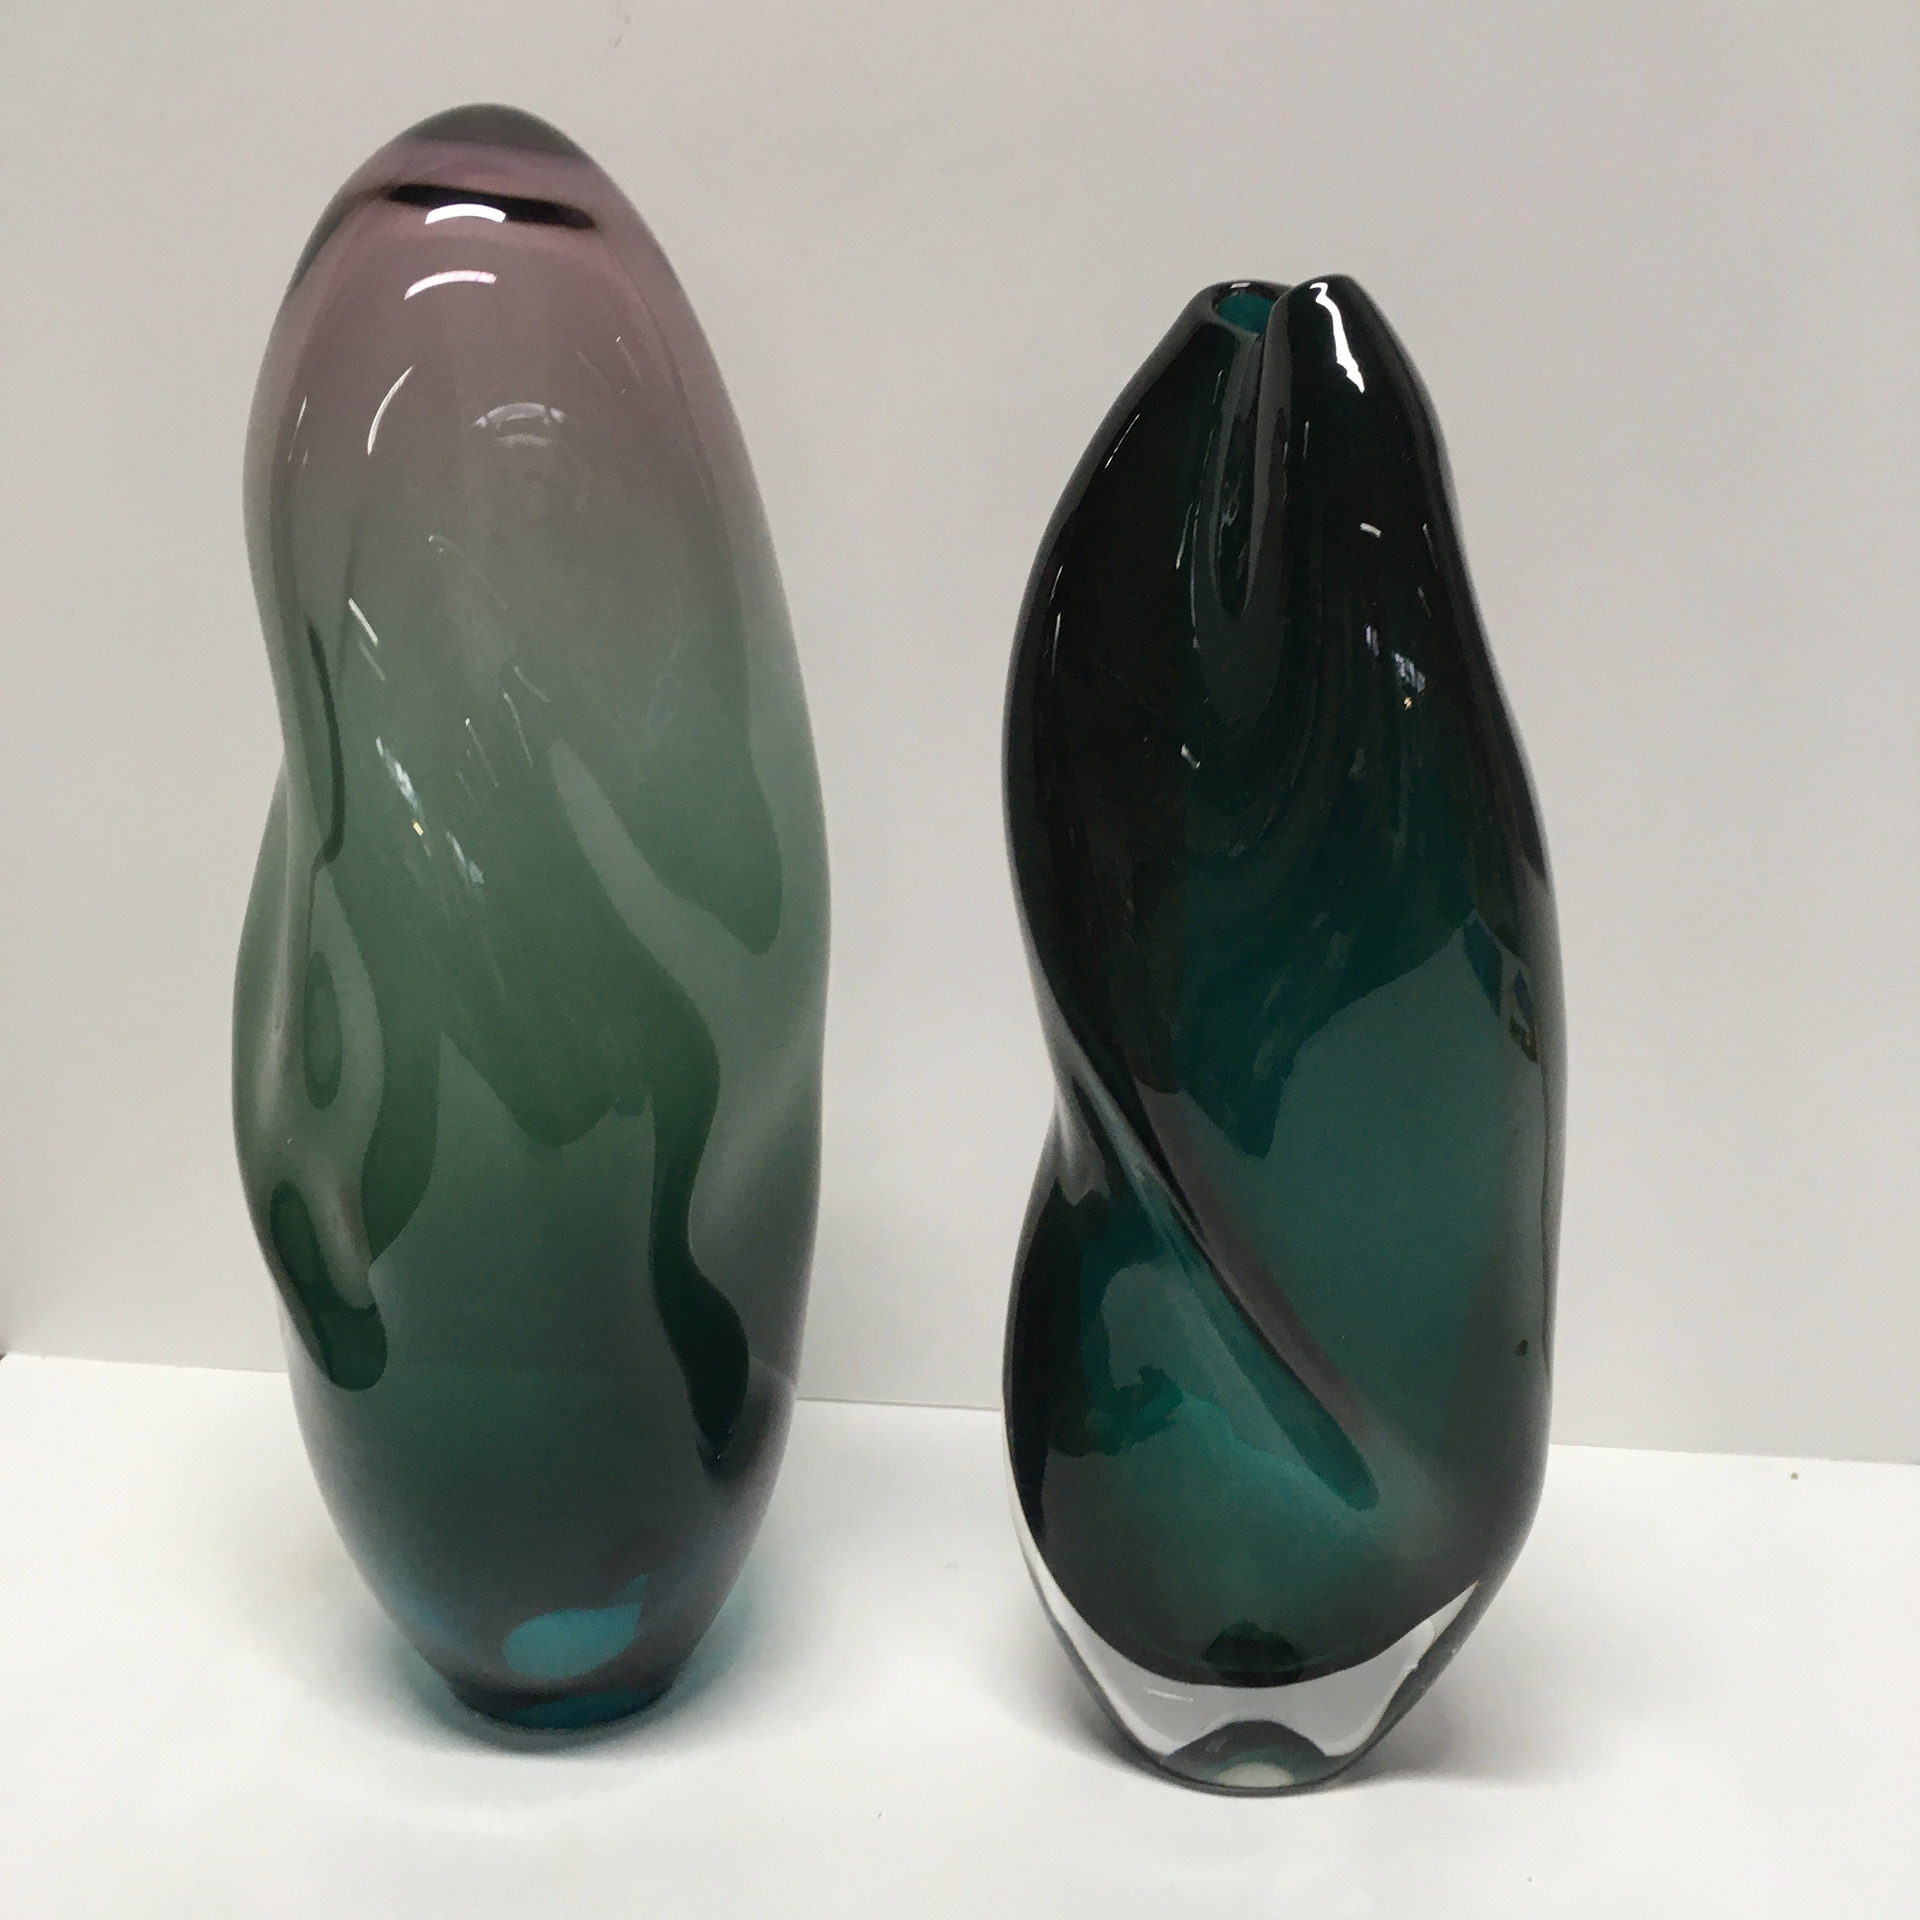 'Purple/Green Lift' 34cm & 'Green Twist Vase' 32cm